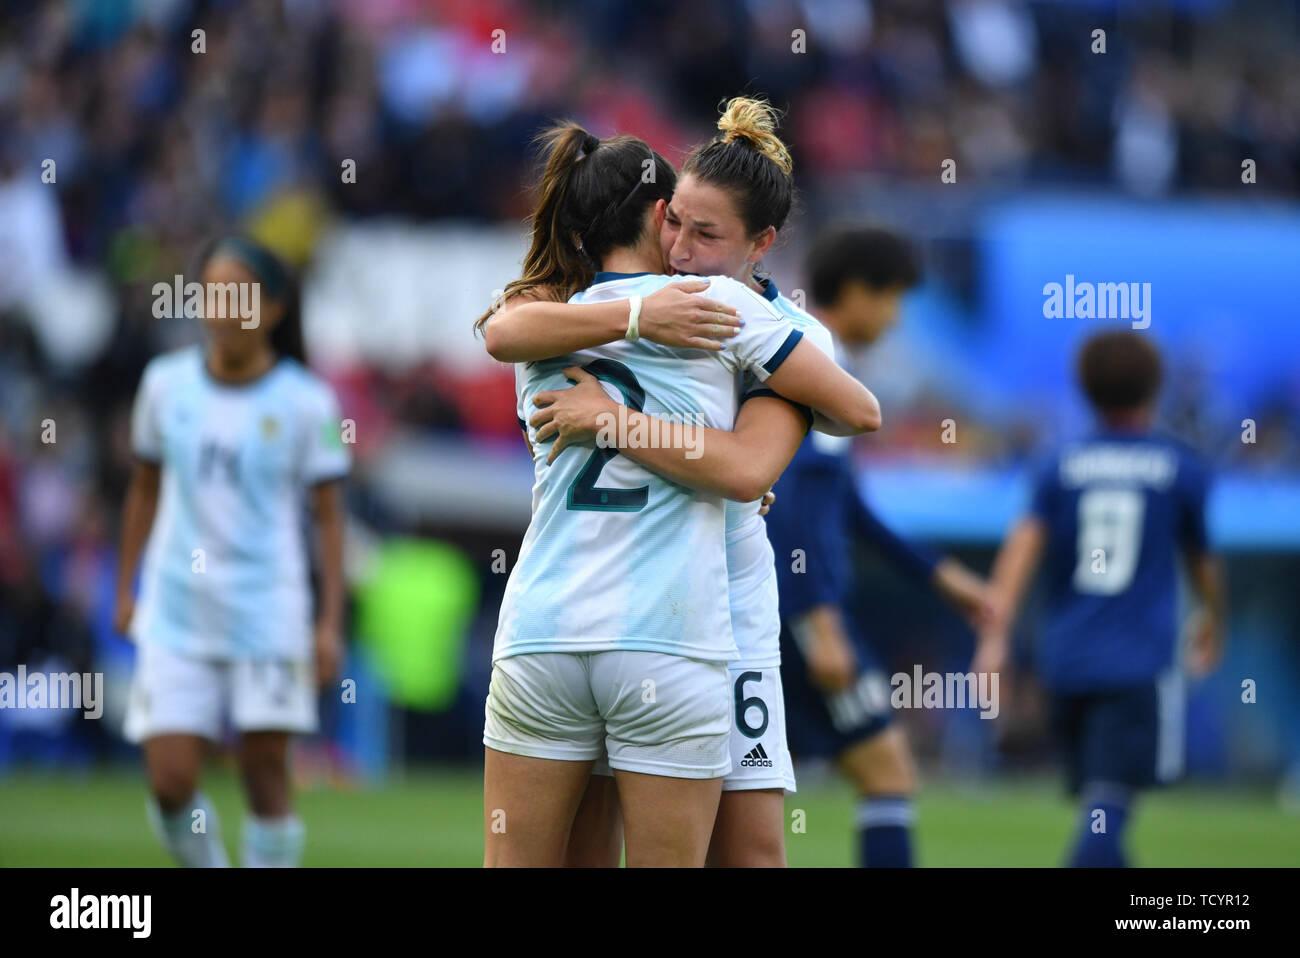 10 june 2019 Paris, France Soccer Women's World Cup France 2019: Argentina v Japan   Happy Argentina Player Agustina Barroso (Argentinien) (2) and Ald - Stock Image